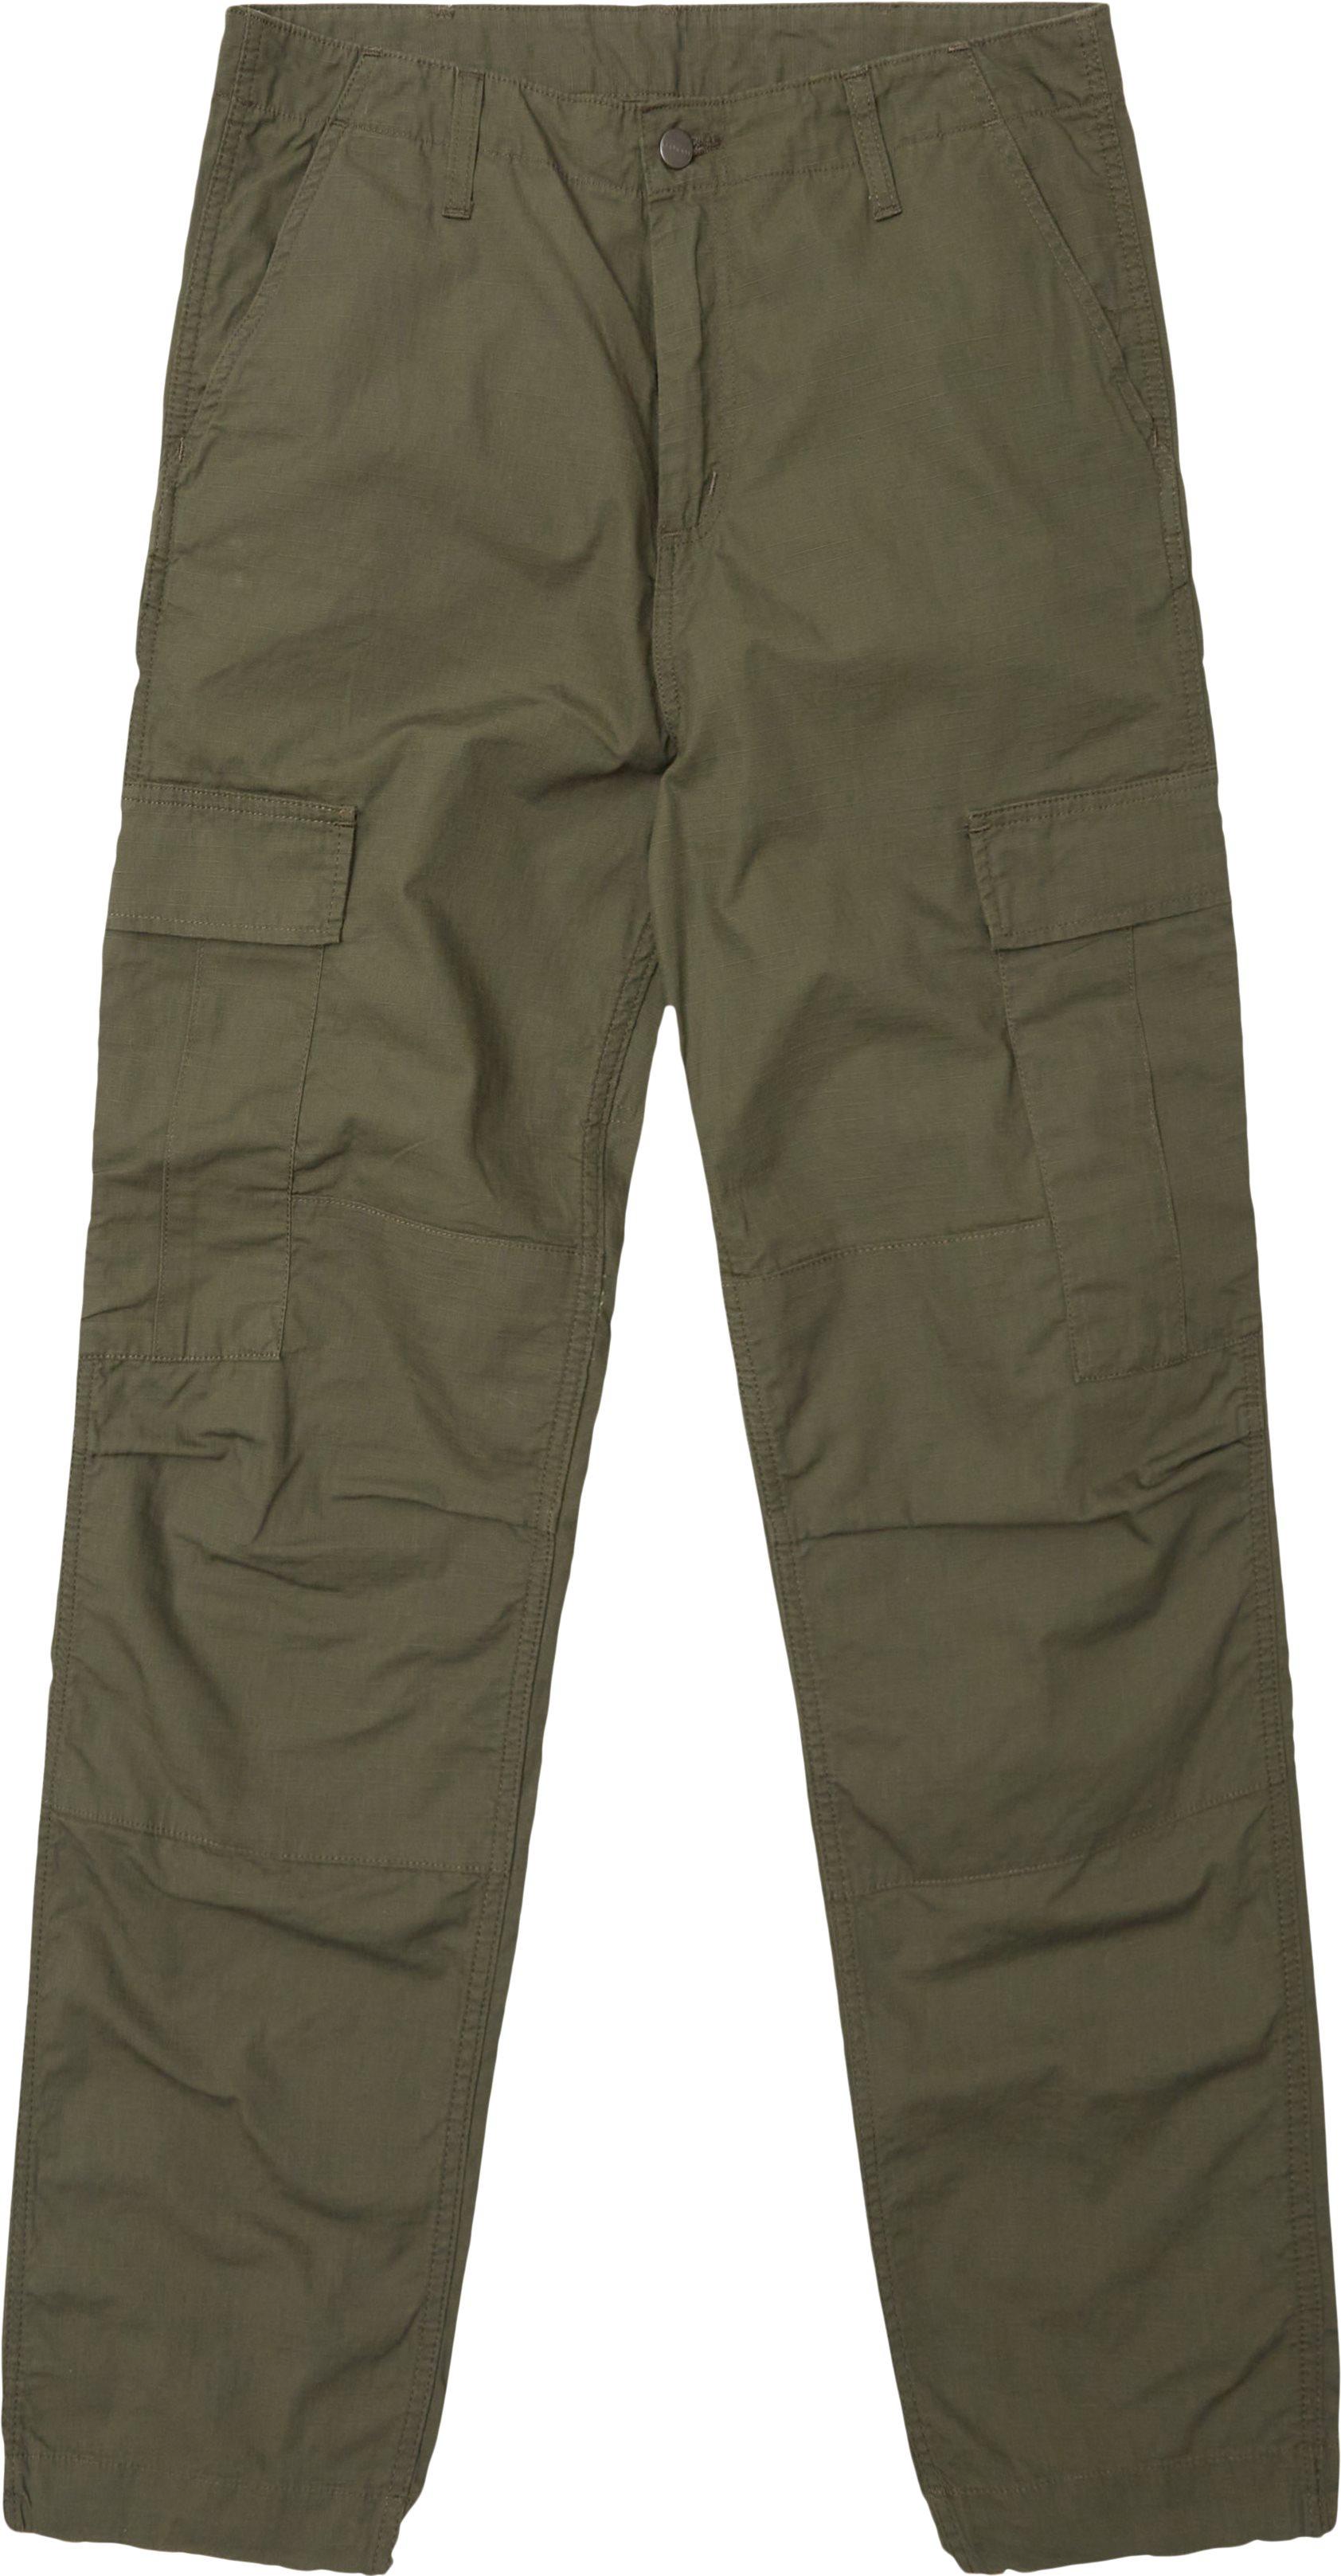 Trousers - Regular - Green